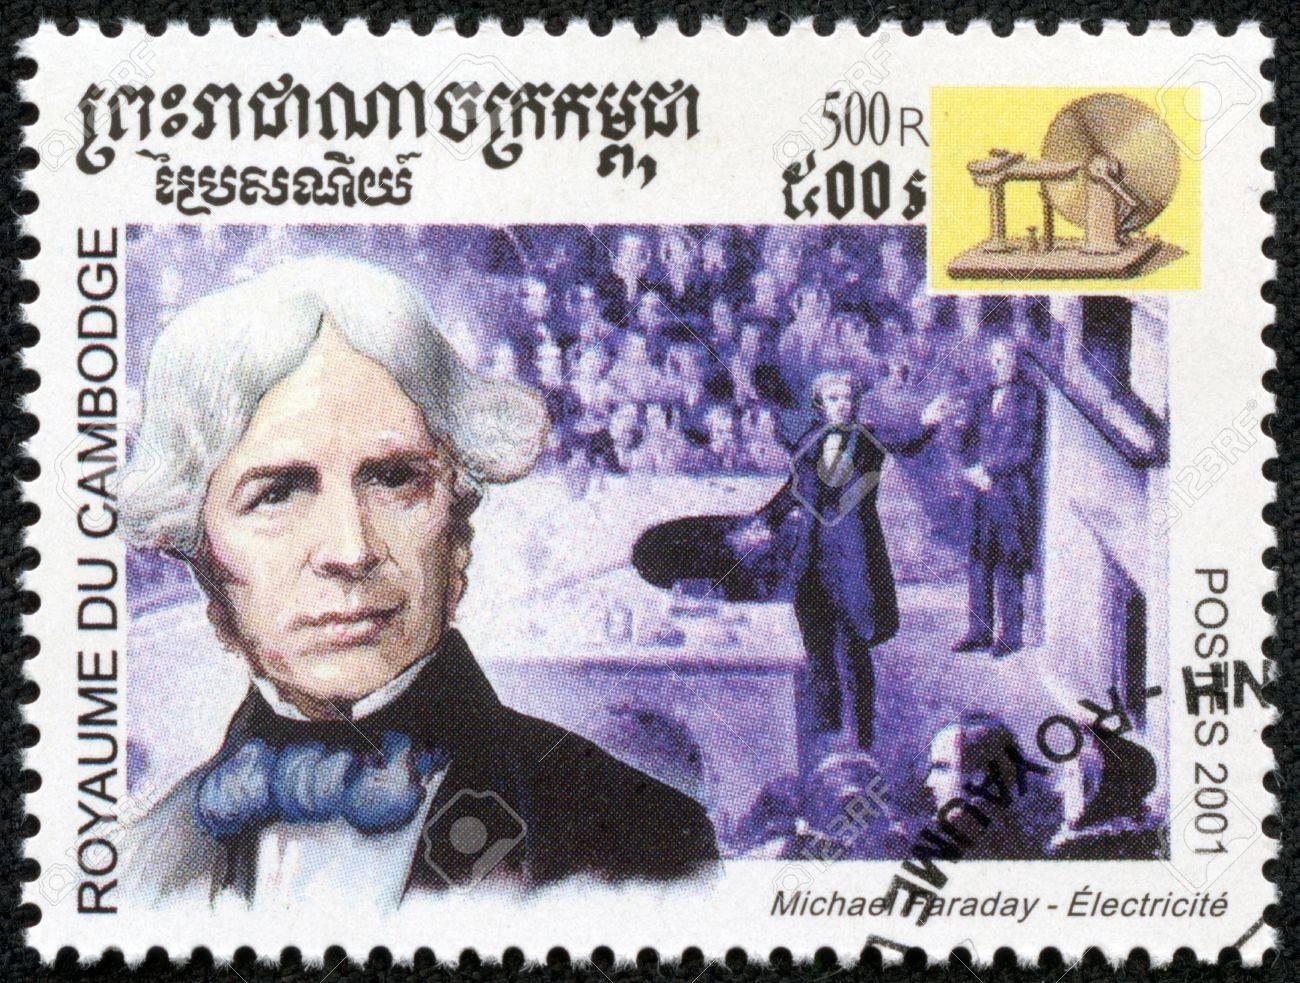 CAMBODIA - CIRCA 2001  stamp printed by Cambodia, shows image of english scientist Michael Faraday,telephone,c irca 2001  Stock Photo - 17436872